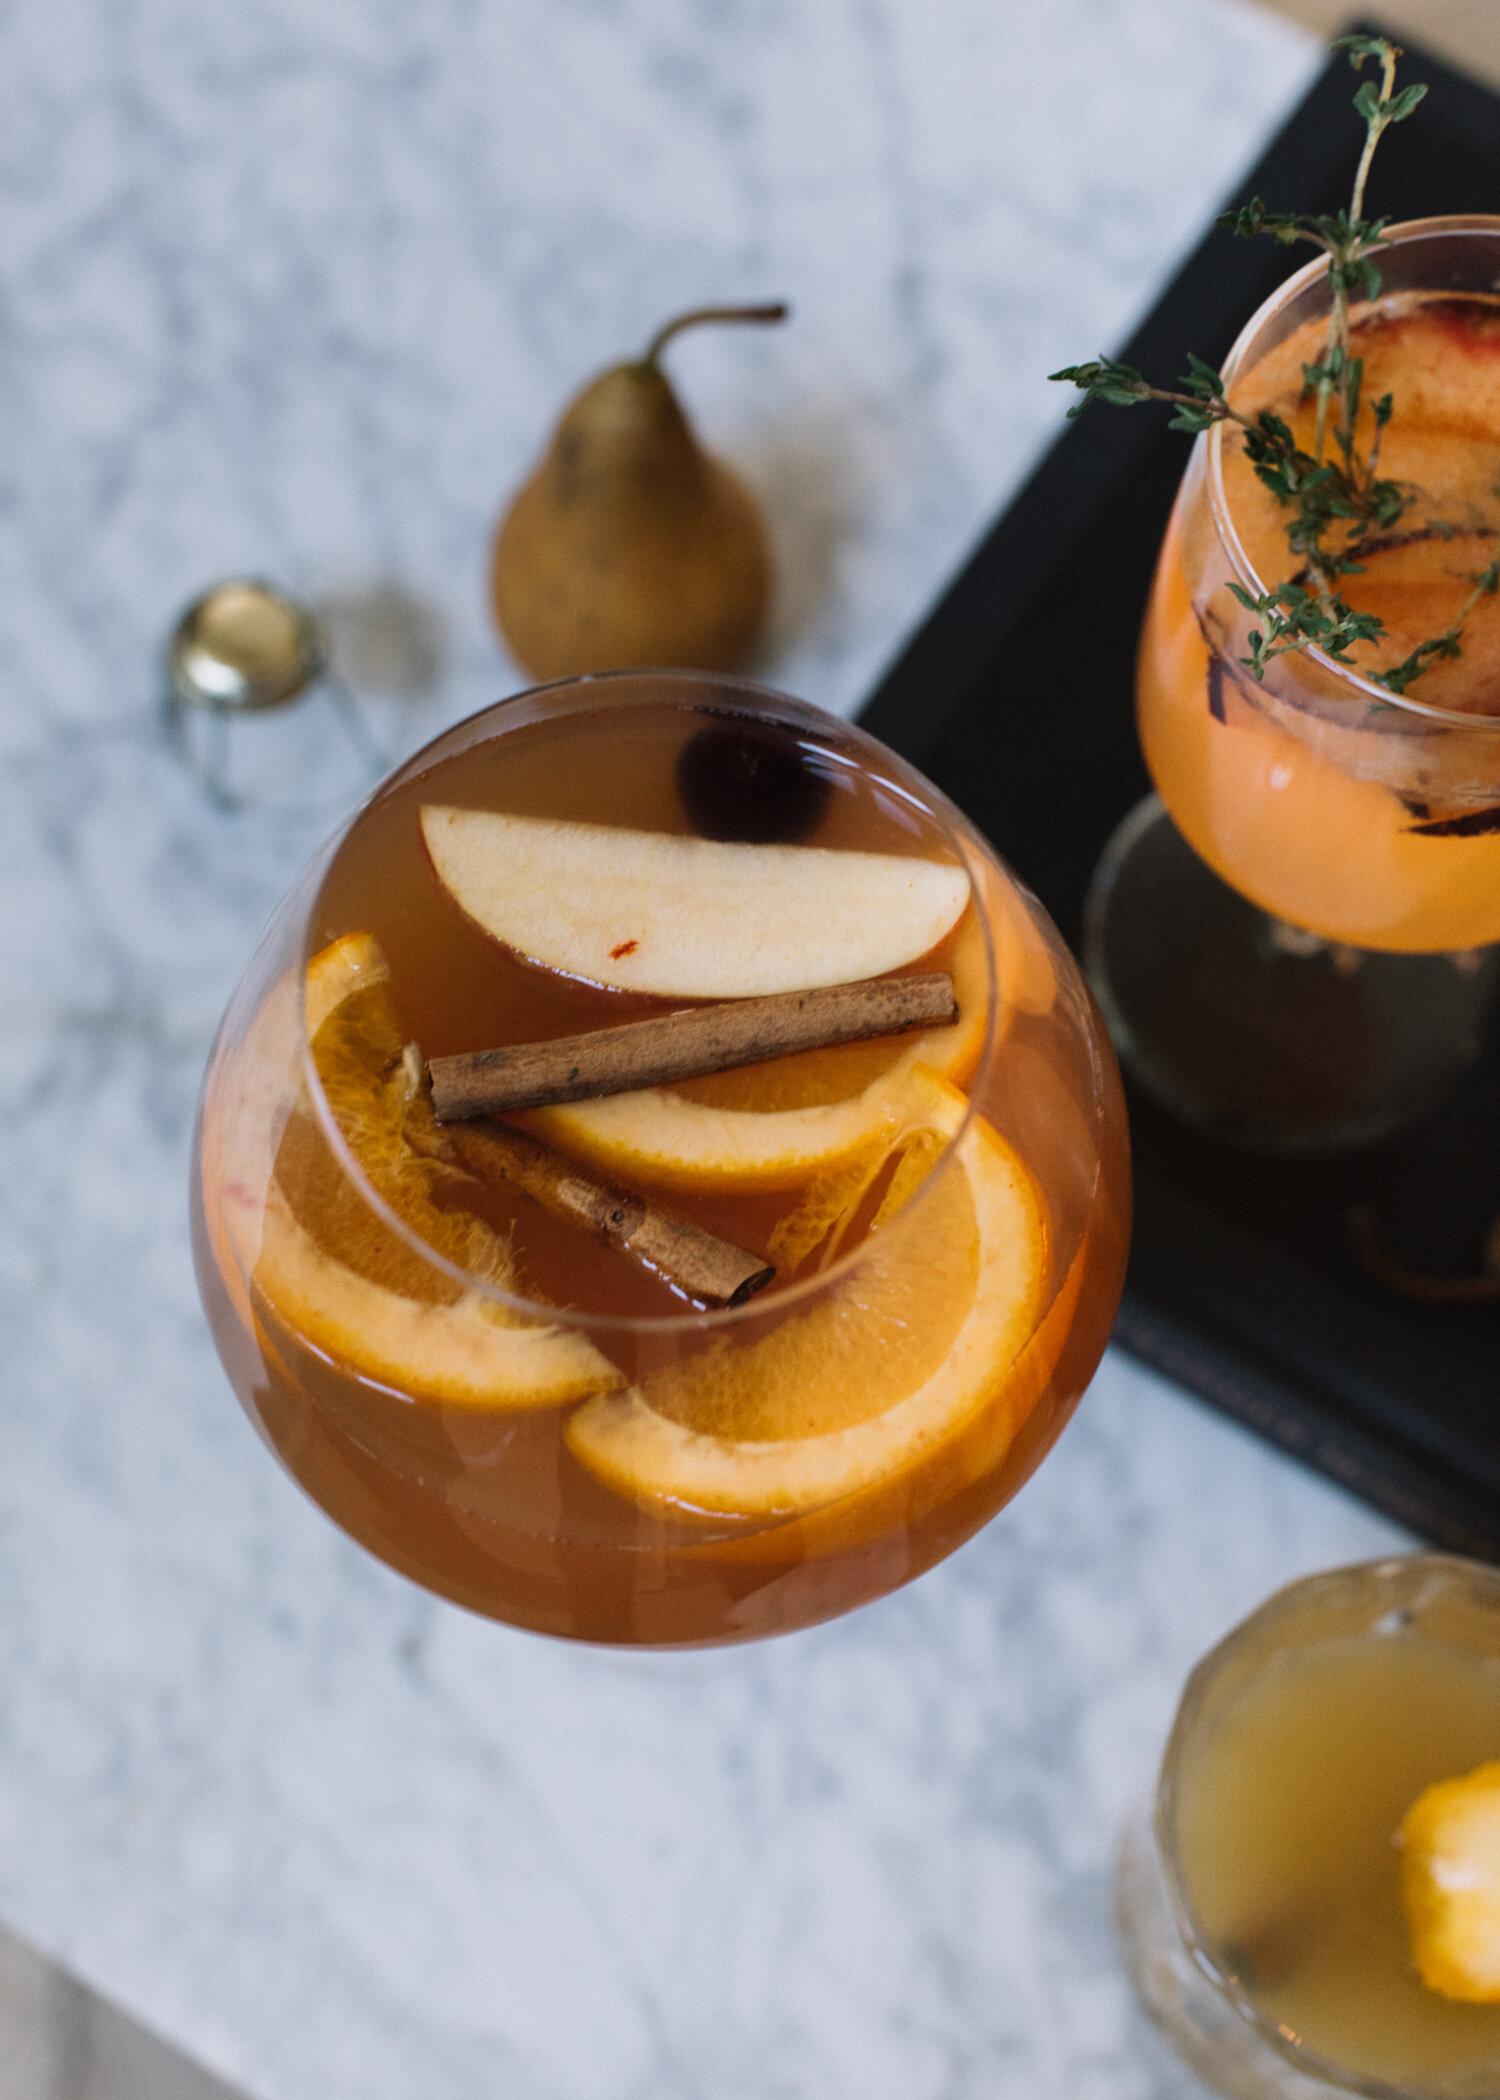 Seasonal Spiced Apple Cider Sangria - A Fabulous Fete